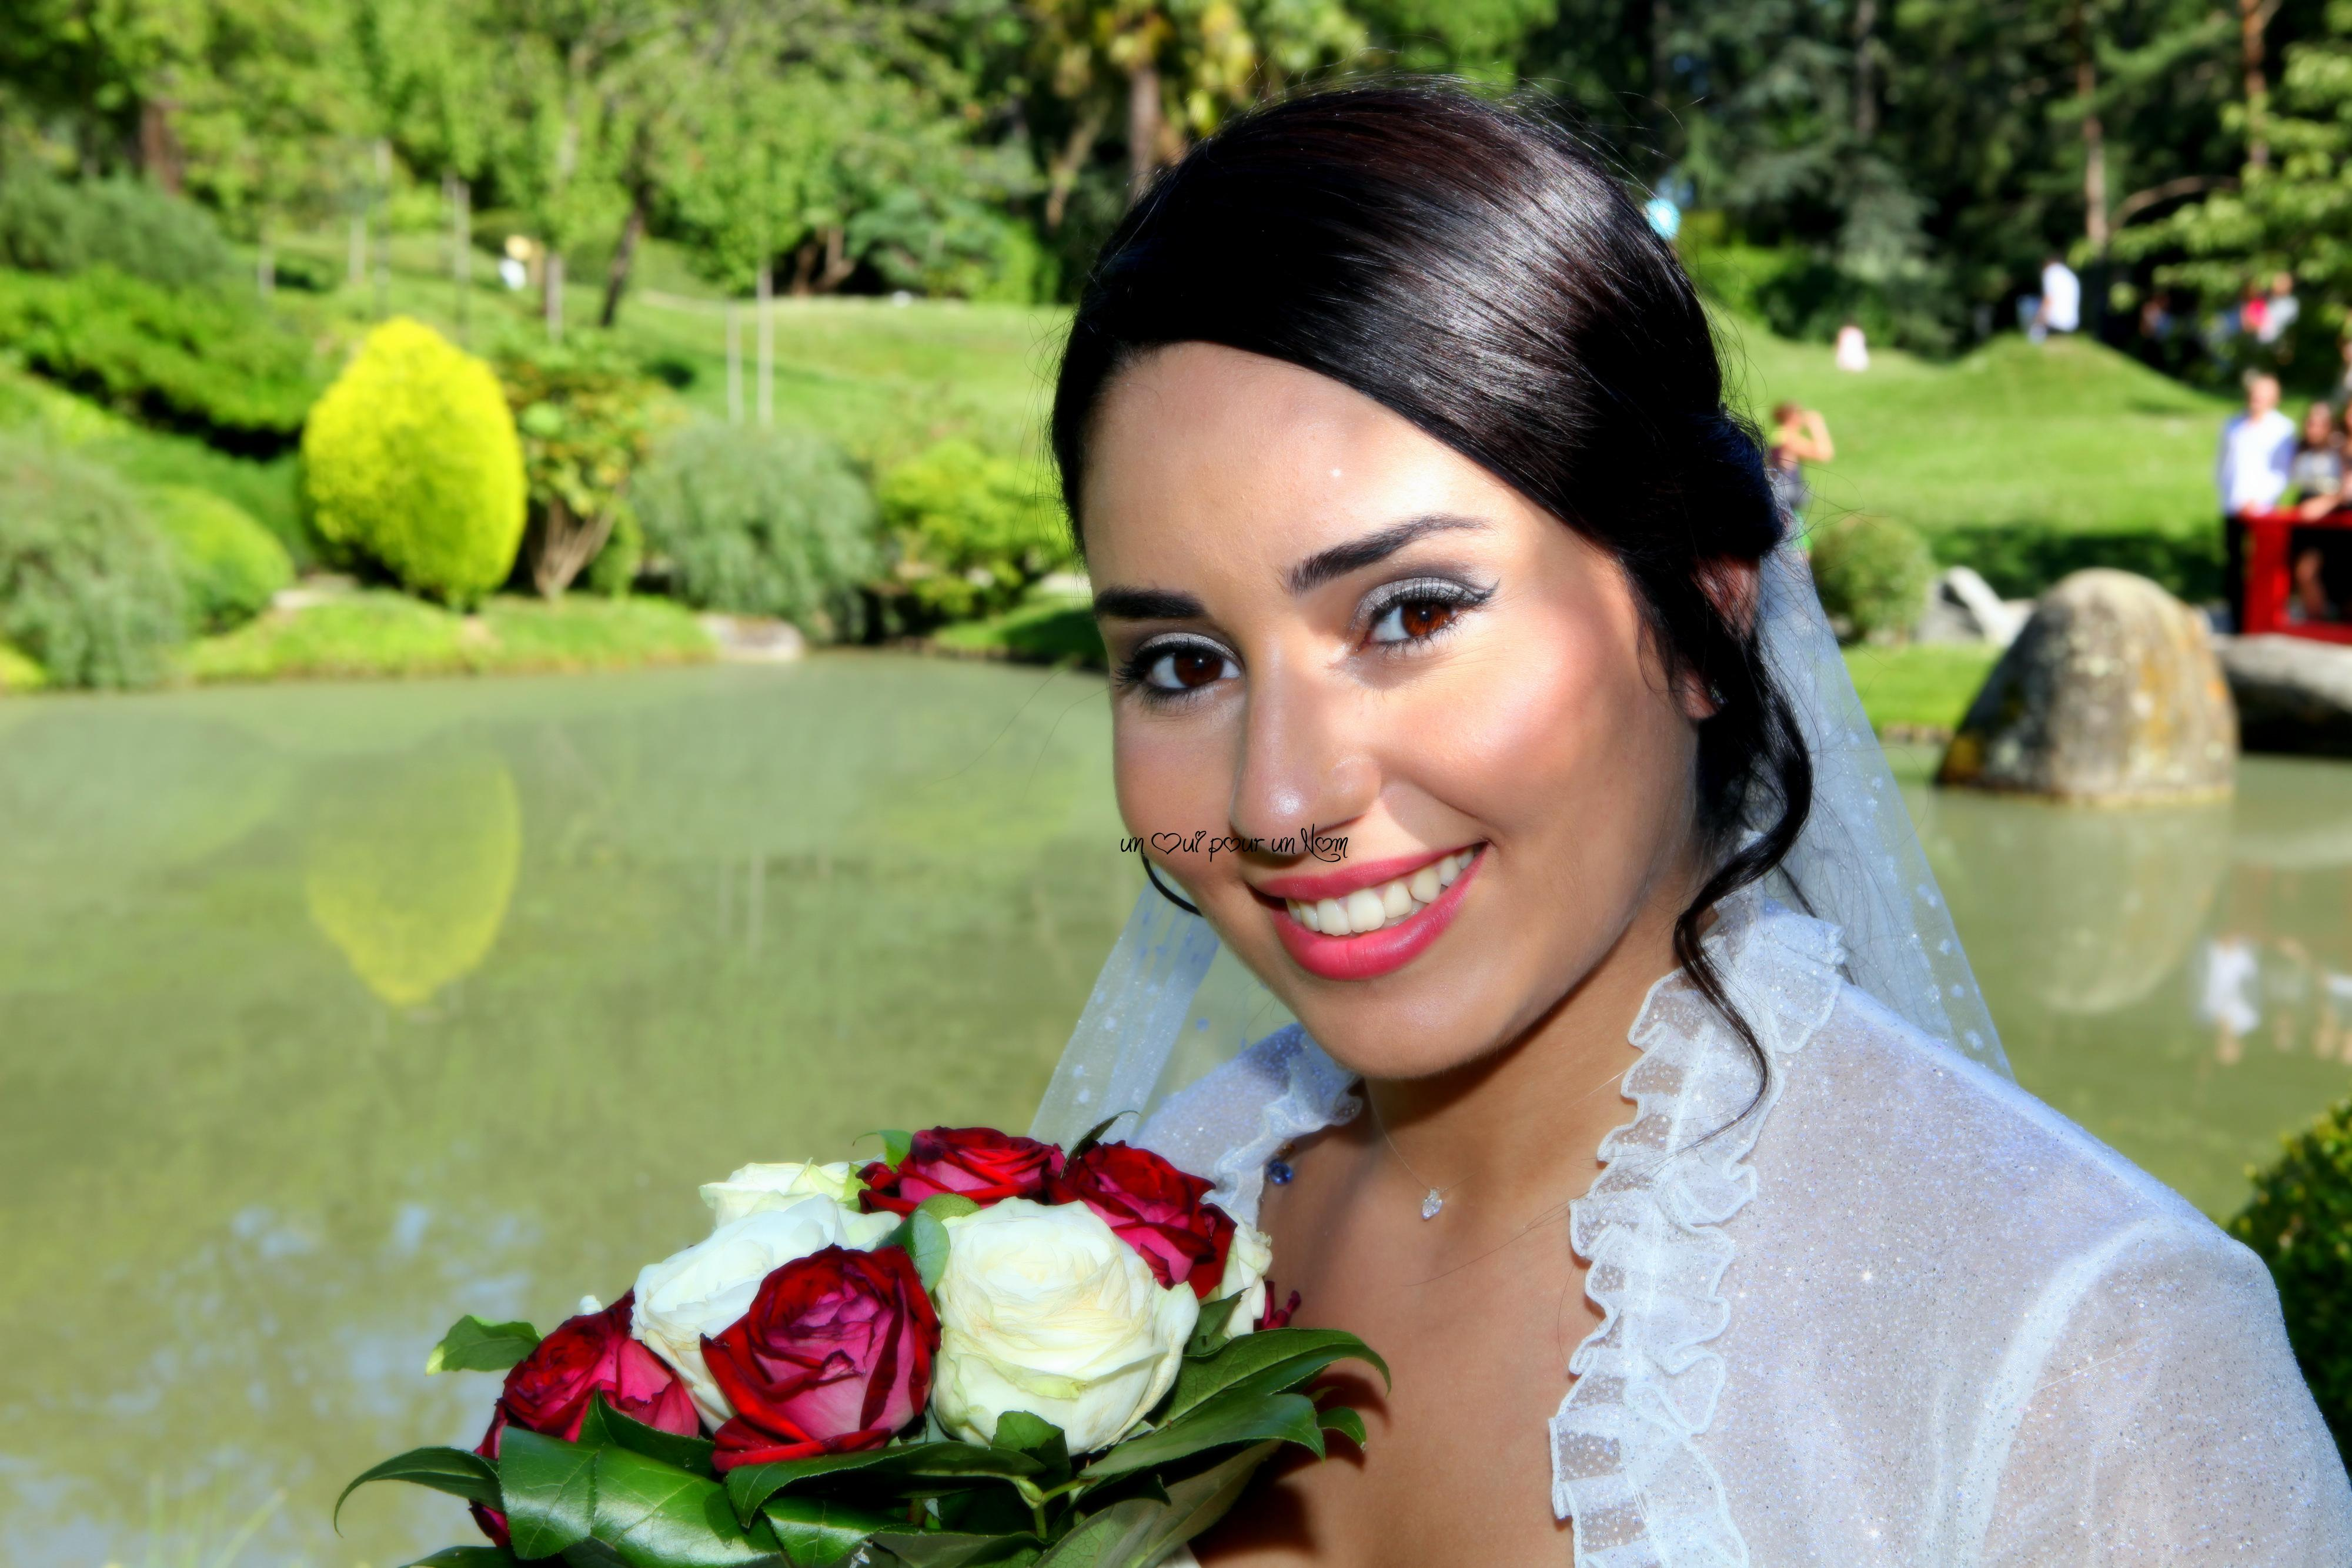 photographe cameraman mariage oriental toulouse - Photographe Cameraman Mariage Oriental